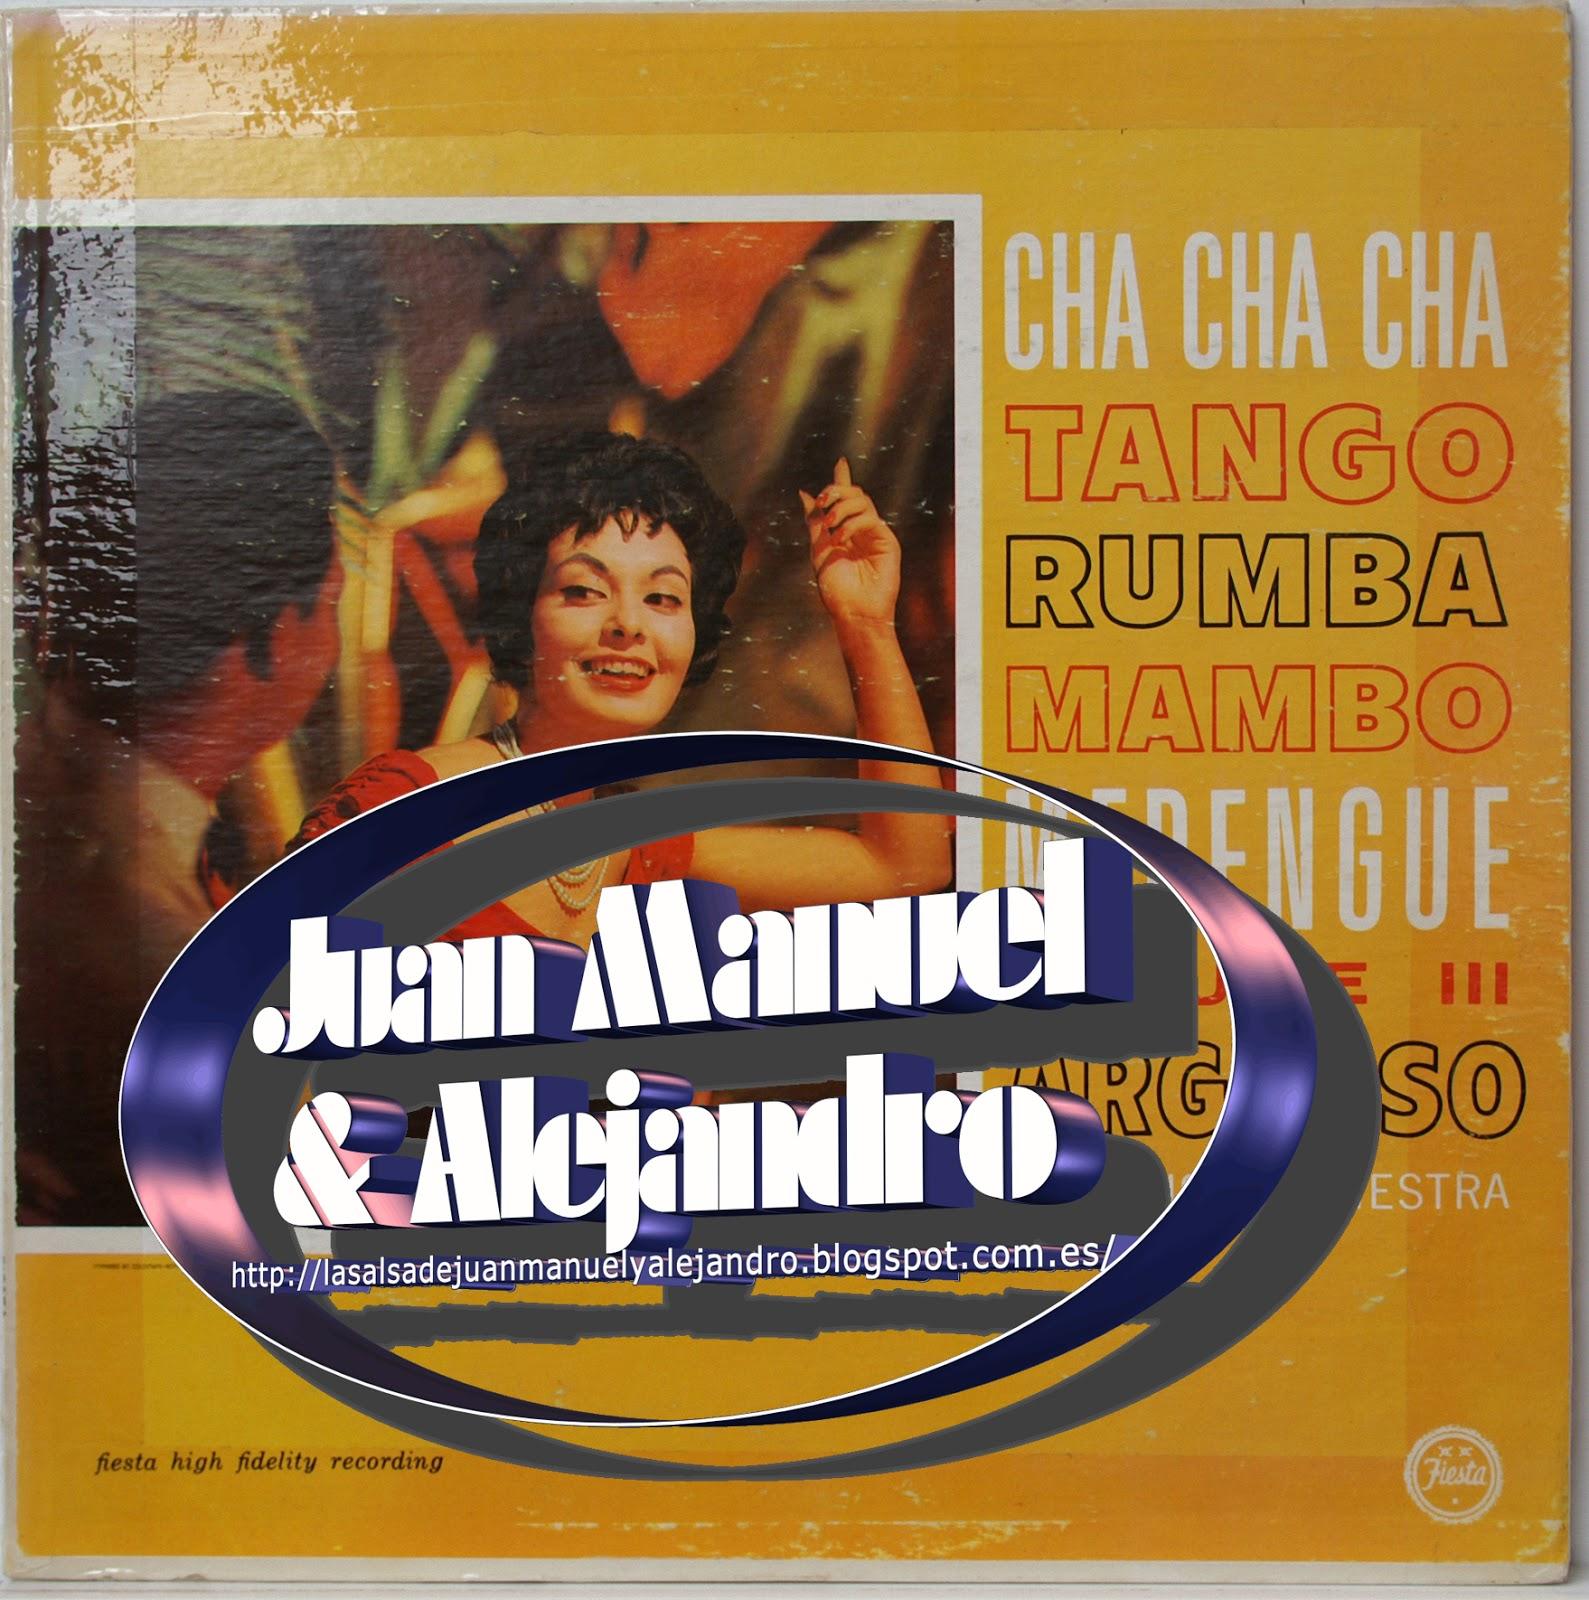 Argueso And Orchestra Ramon Argueso's Orchestra and Cuso Mendoza'z Cuso Mensoza's Orchestra Merengue - Mambo - Cha Cha Cha